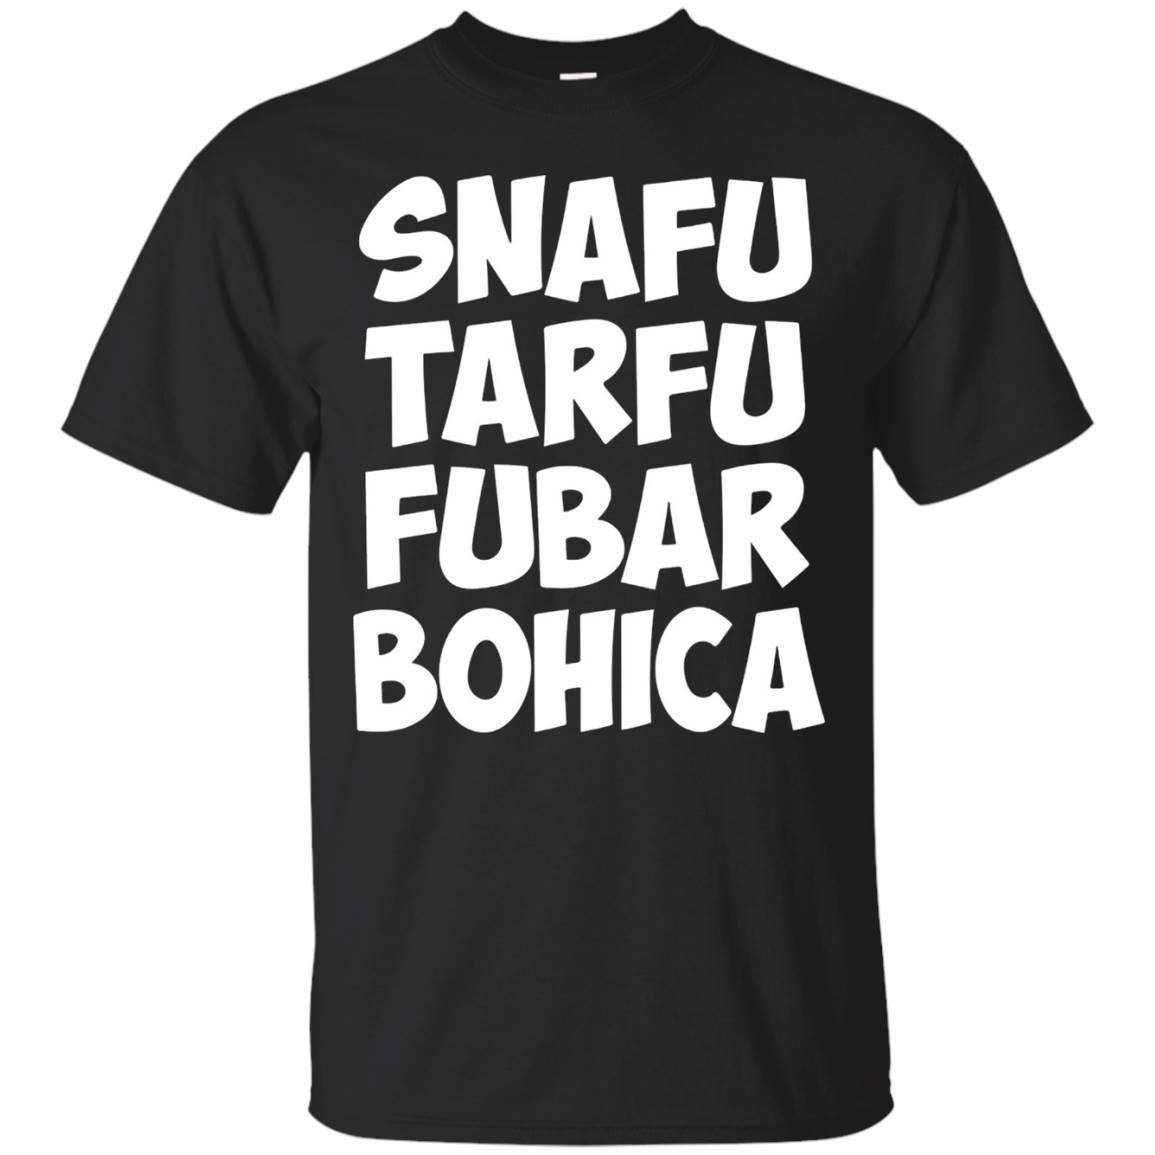 SNAFU TARFU FUBAR BOHICA Military Code – T Shirt